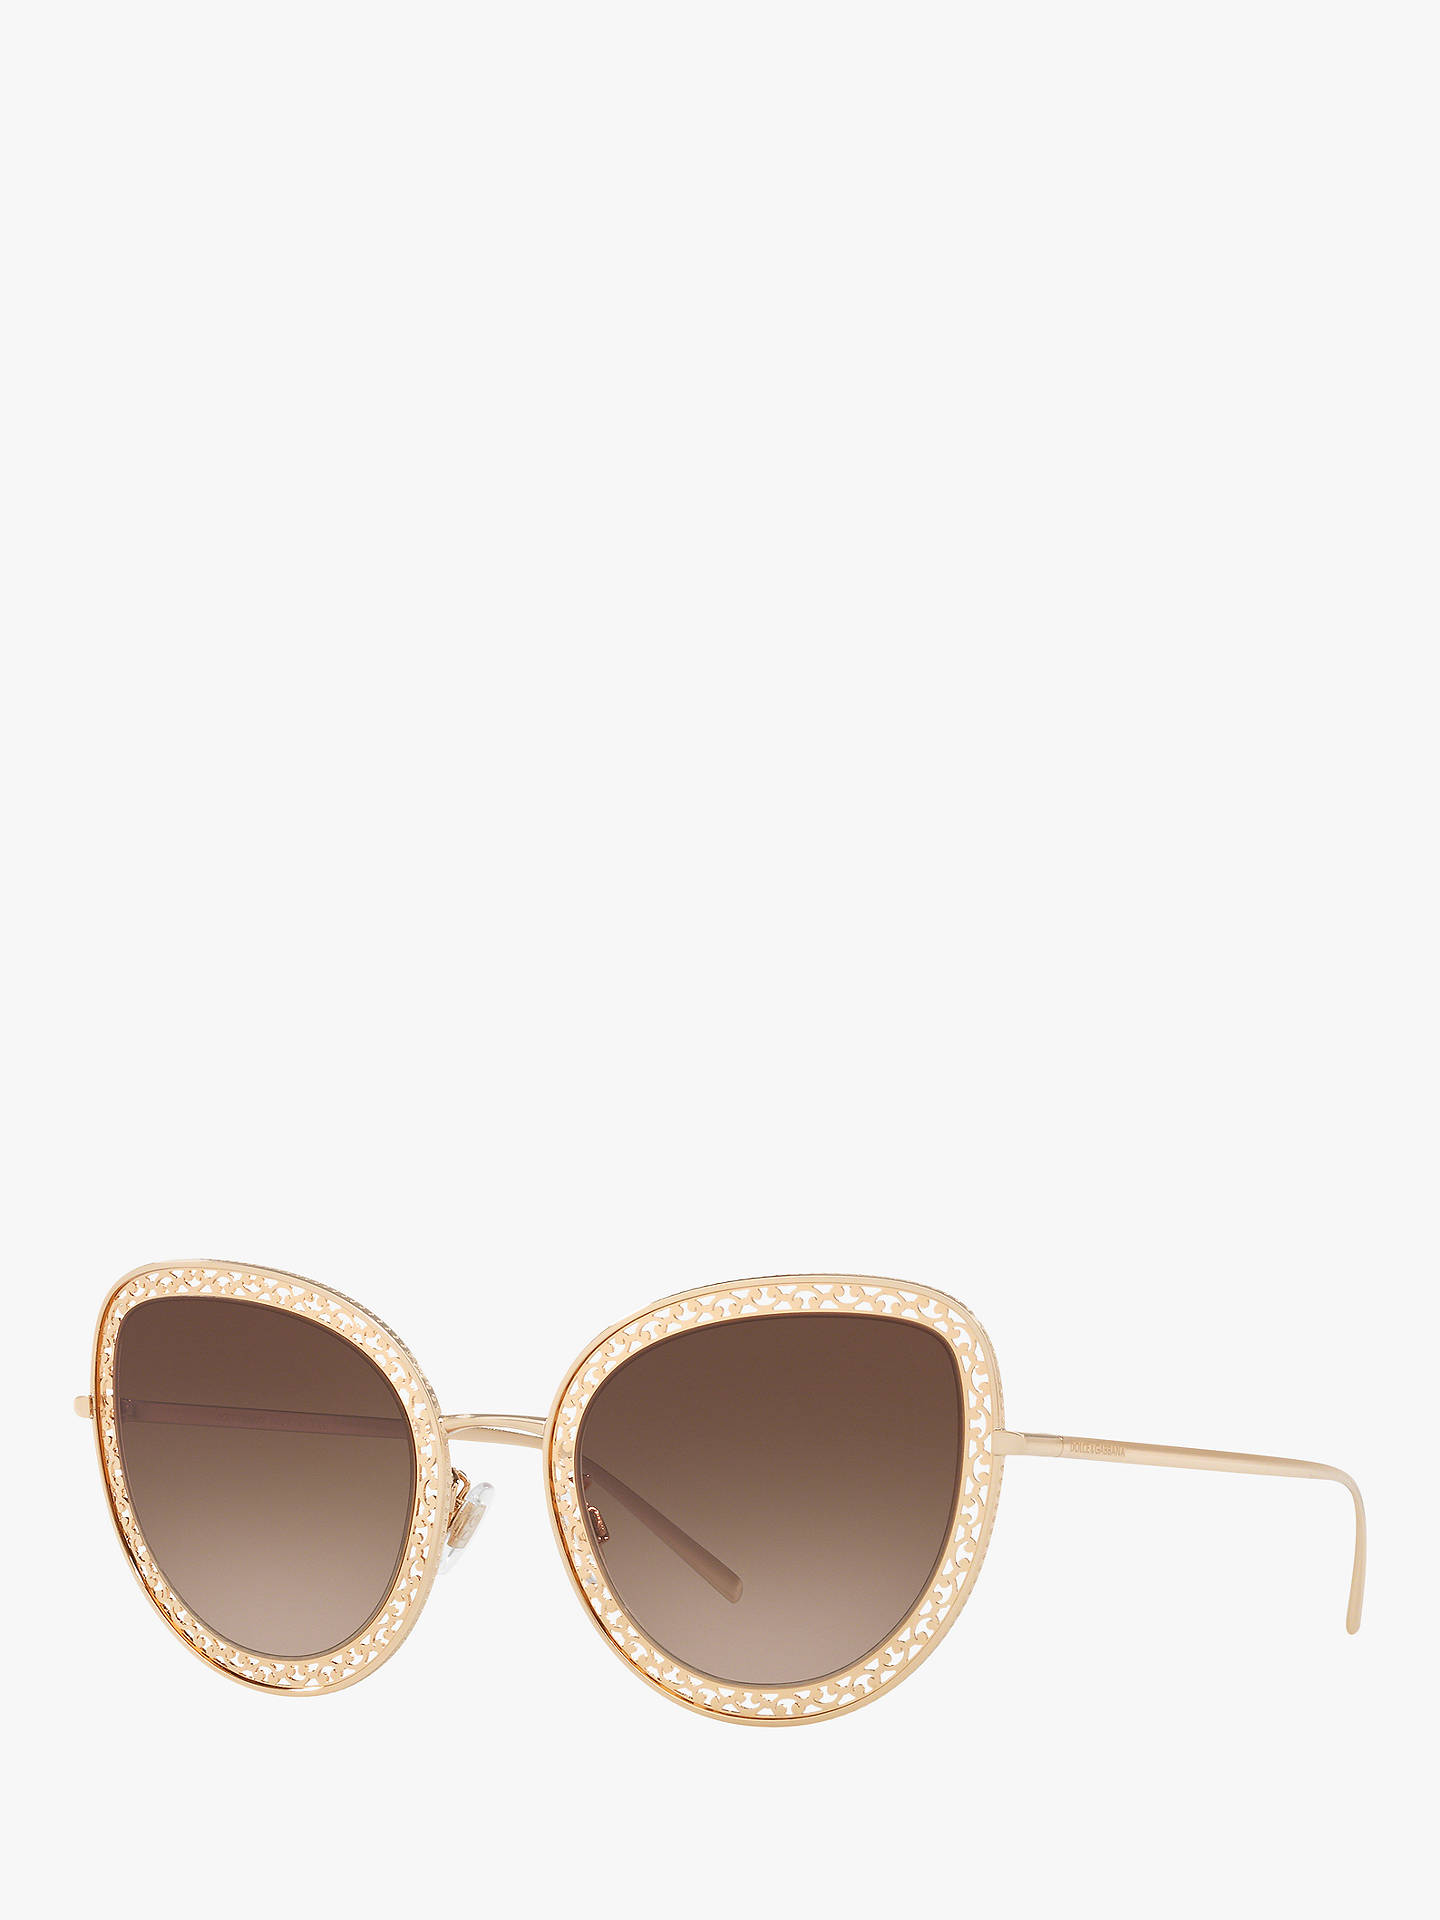 5656139ebe7b Buy Dolce & Gabbana DG2226 Women's Cat's Eye Sunglasses, Gold/Brown  Gradient Online at ...